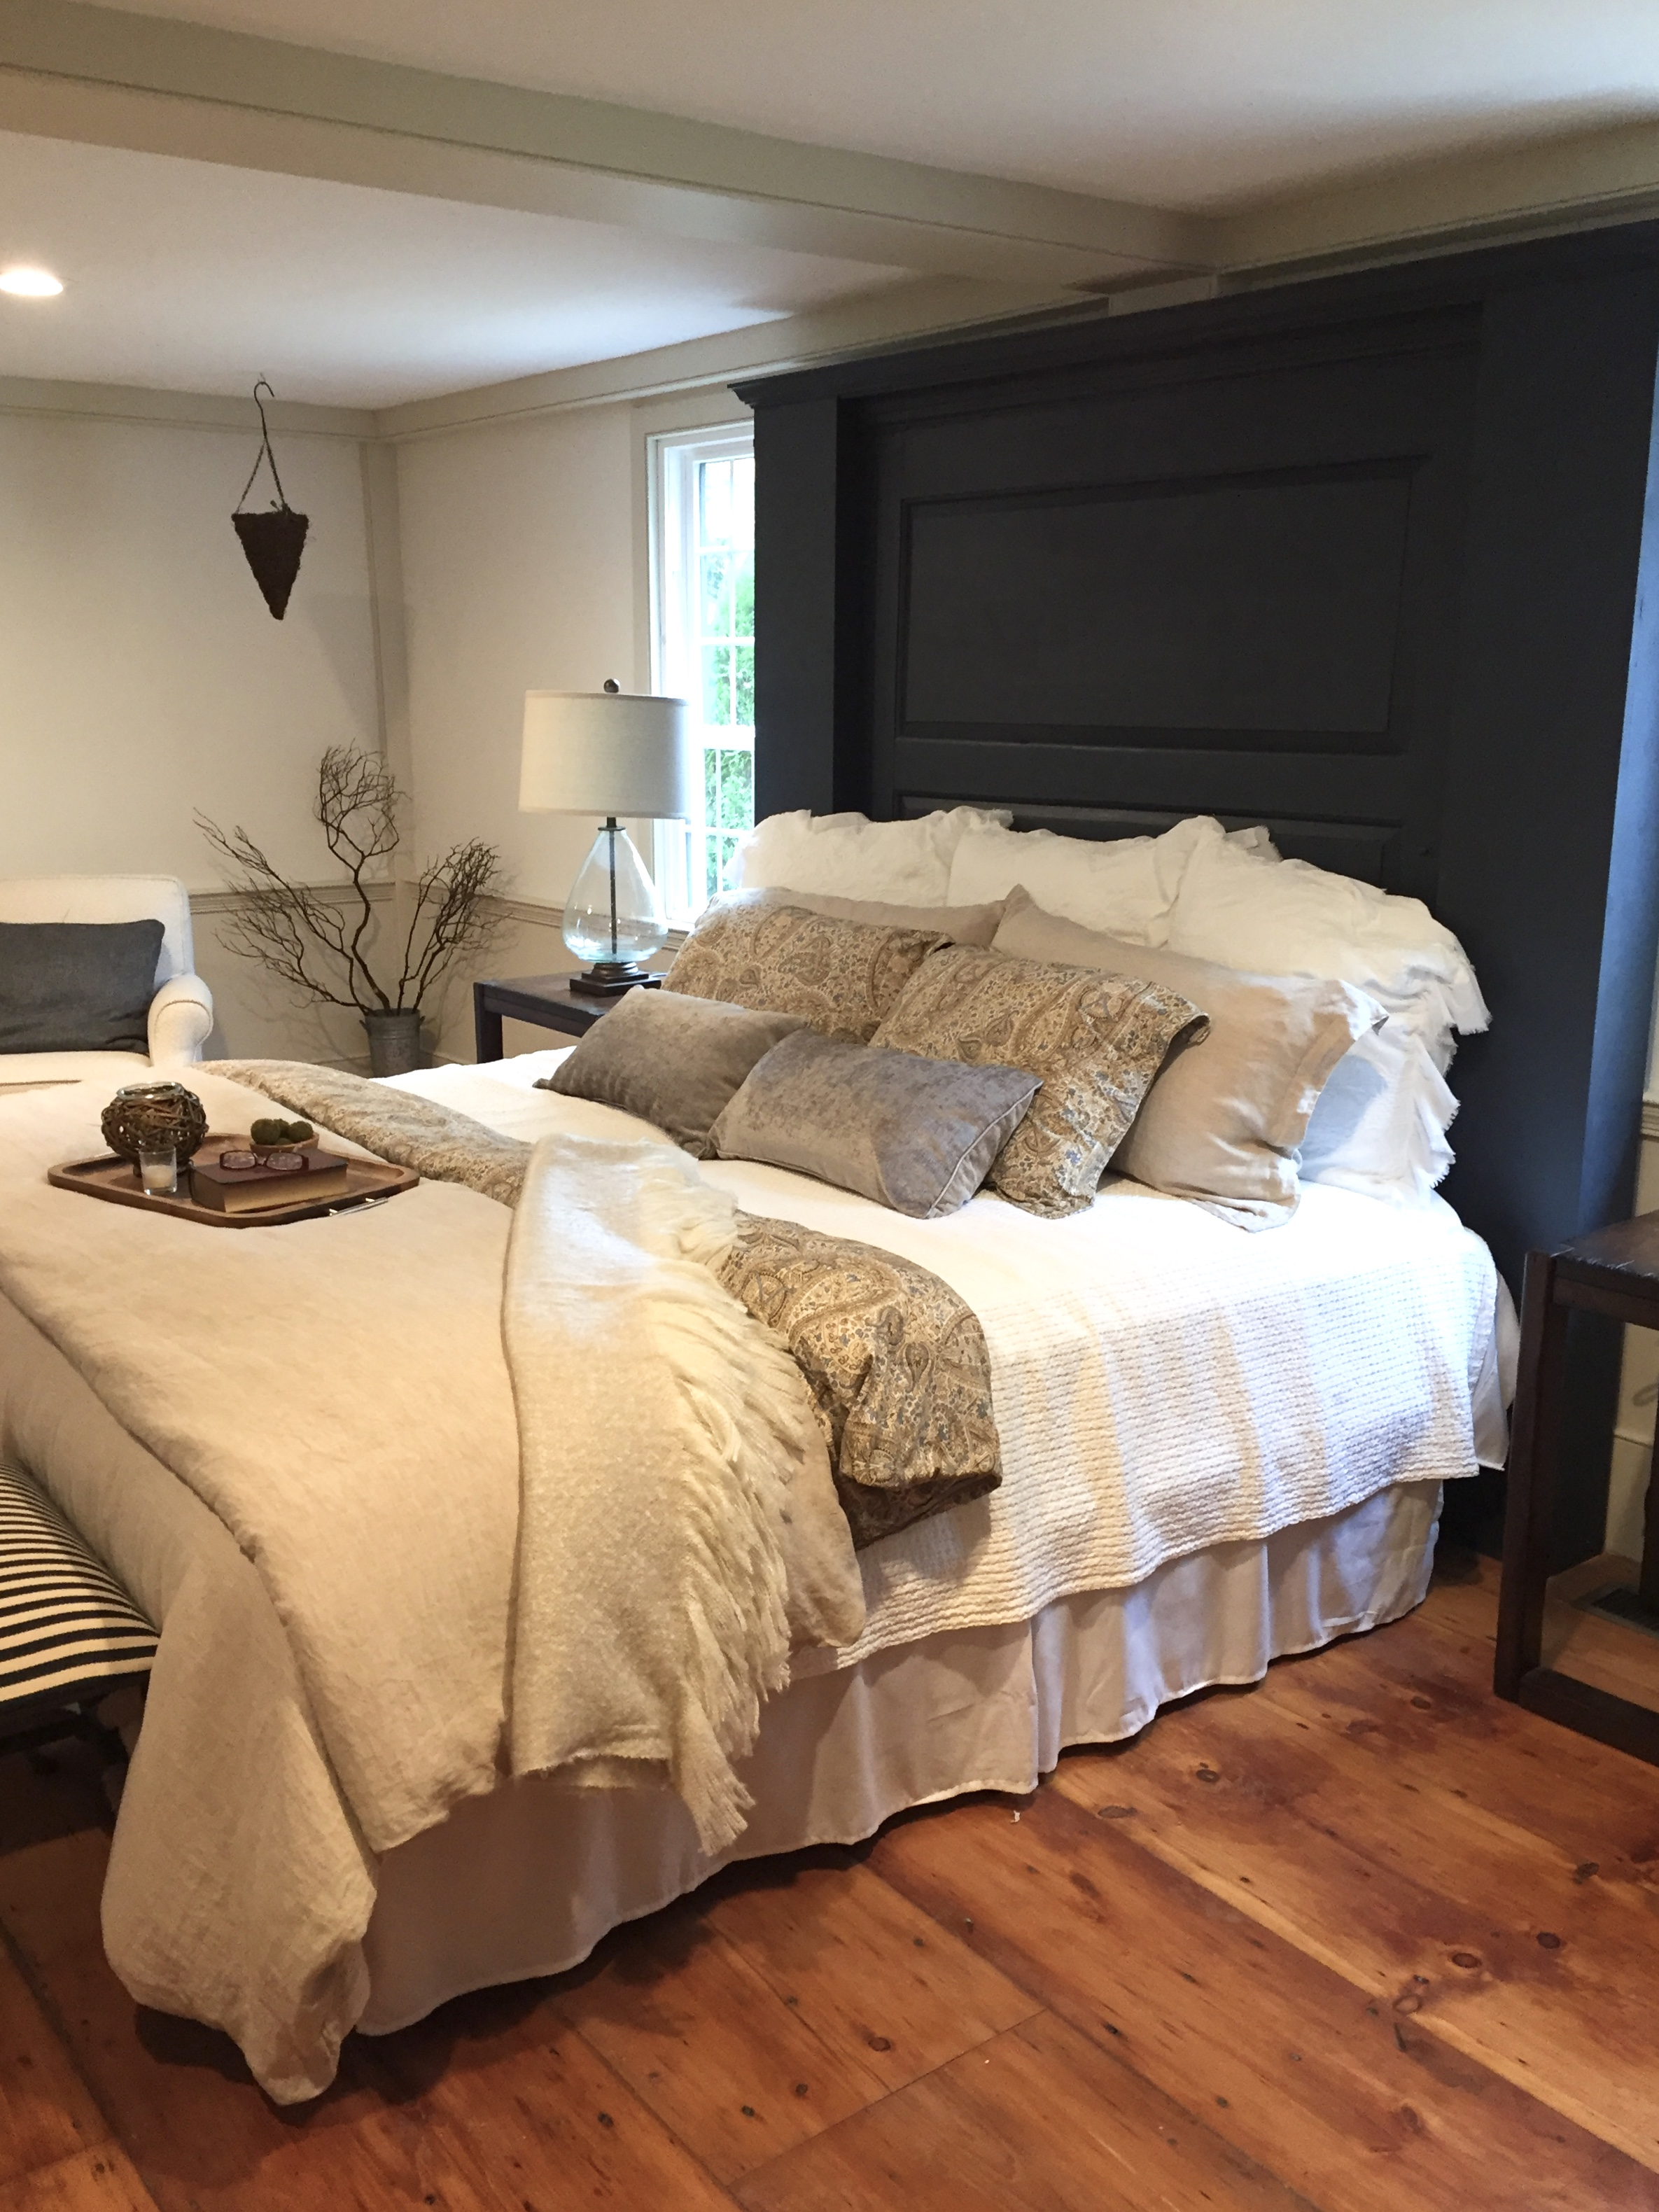 New England style bedroom fireplace mantle headboard